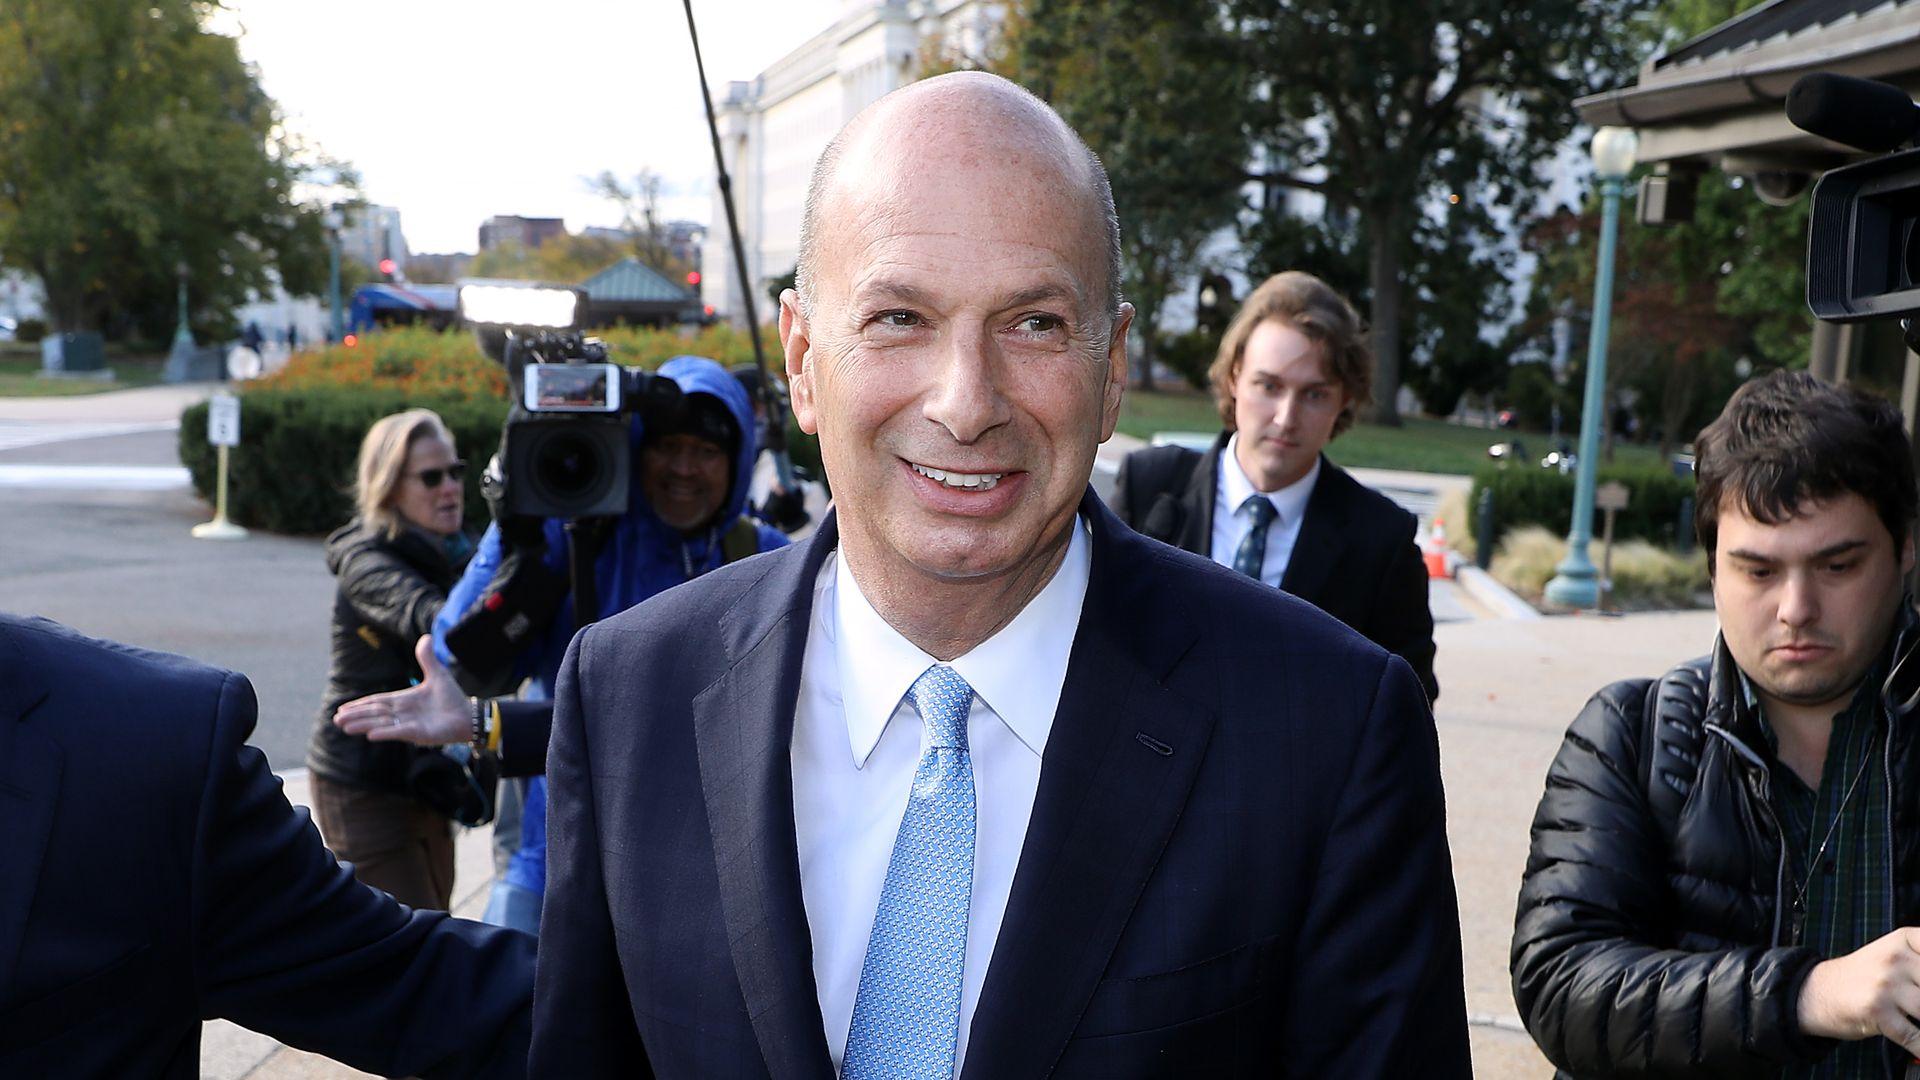 U.S. Ambassador to the European Union Gordon Sondland (C) arrives at the U.S. Capitol on October 17